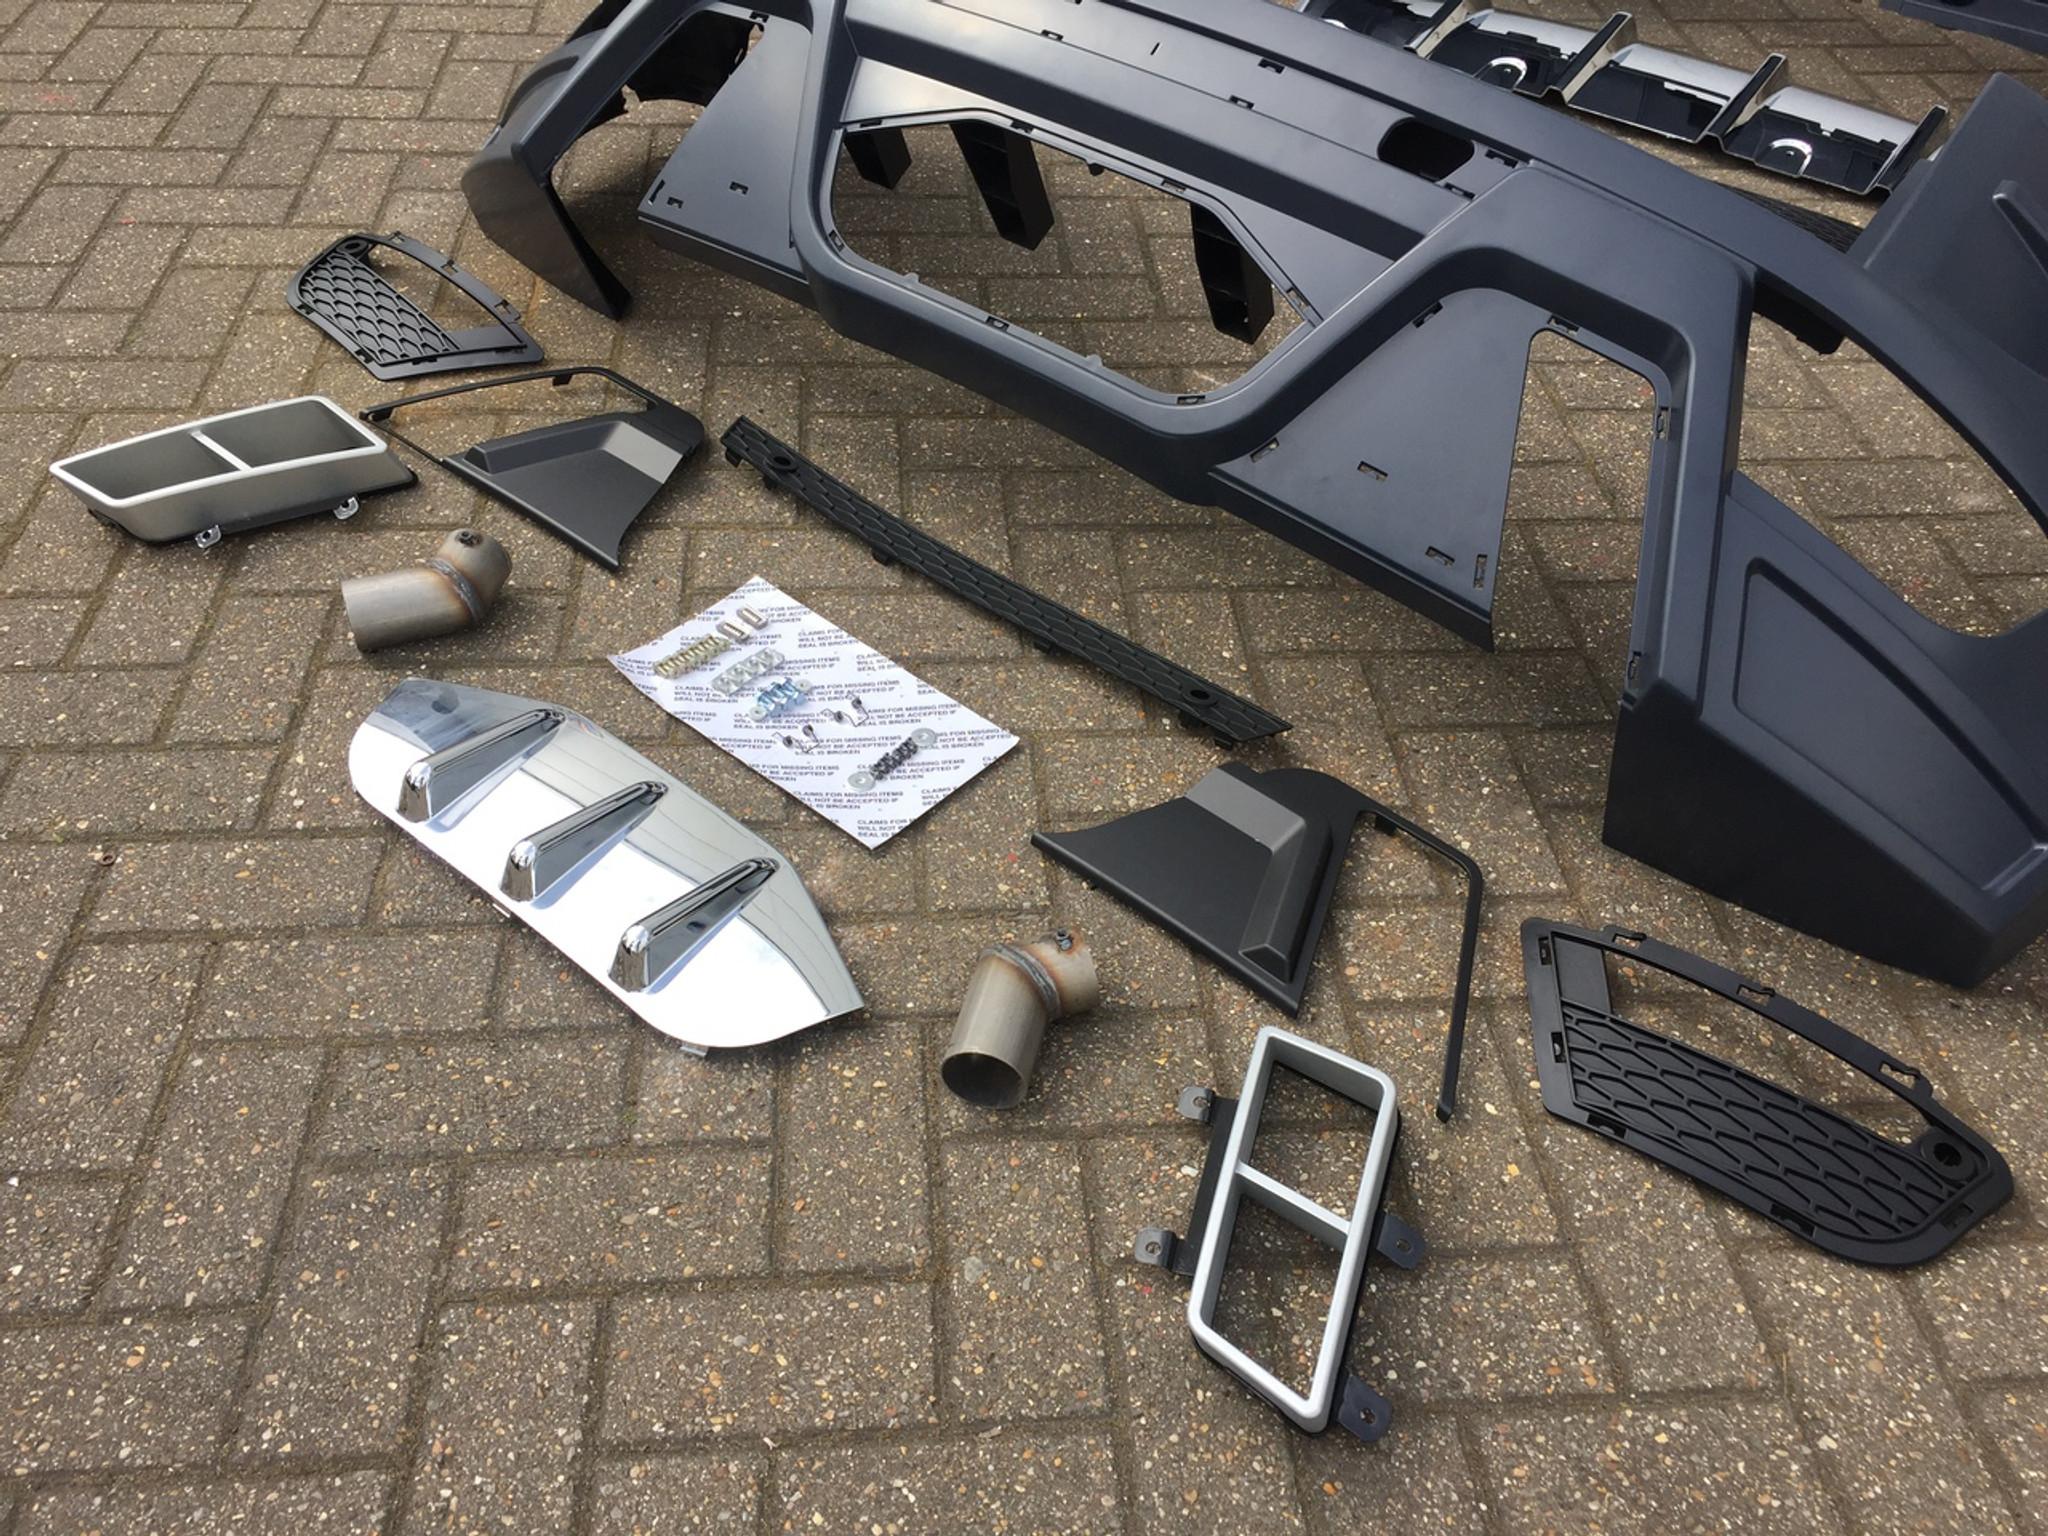 Range Rover Evoque Svr Body Kit Meduza Design Ltd